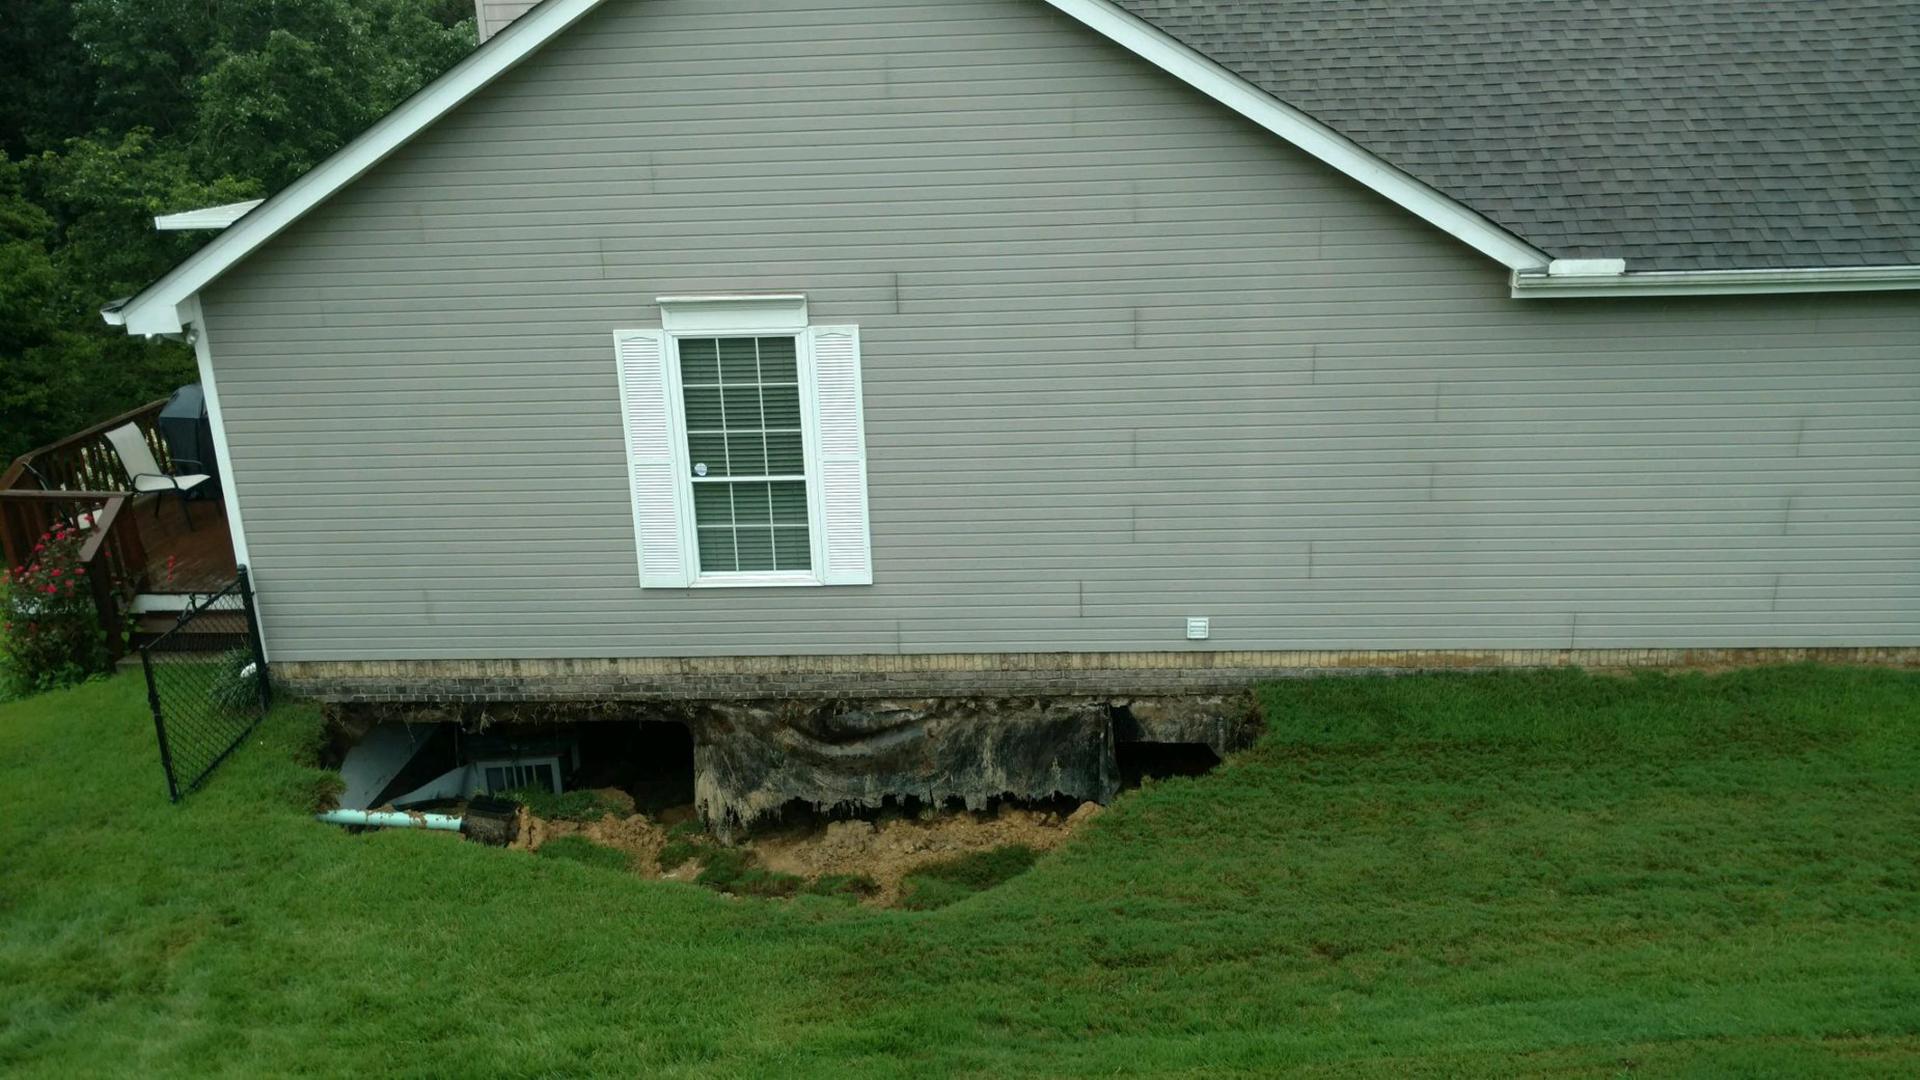 New Chattanooga home pic_1534701780833.jpg.jpg